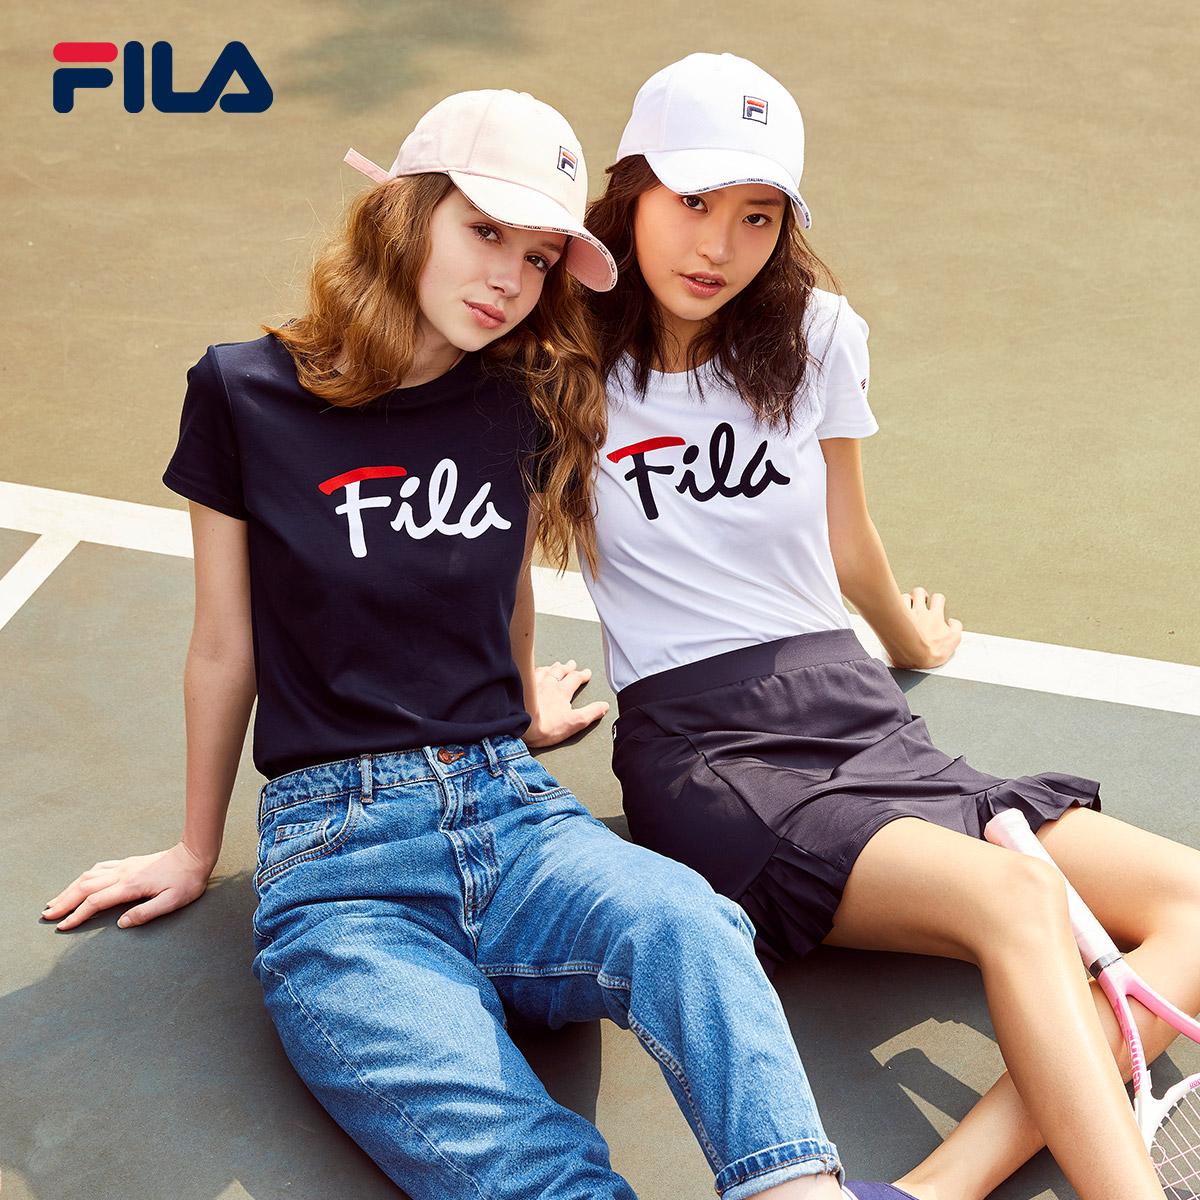 FILA 斐乐官方女子短袖T恤2020春季新款t棉运动打底衫情侣多彩T